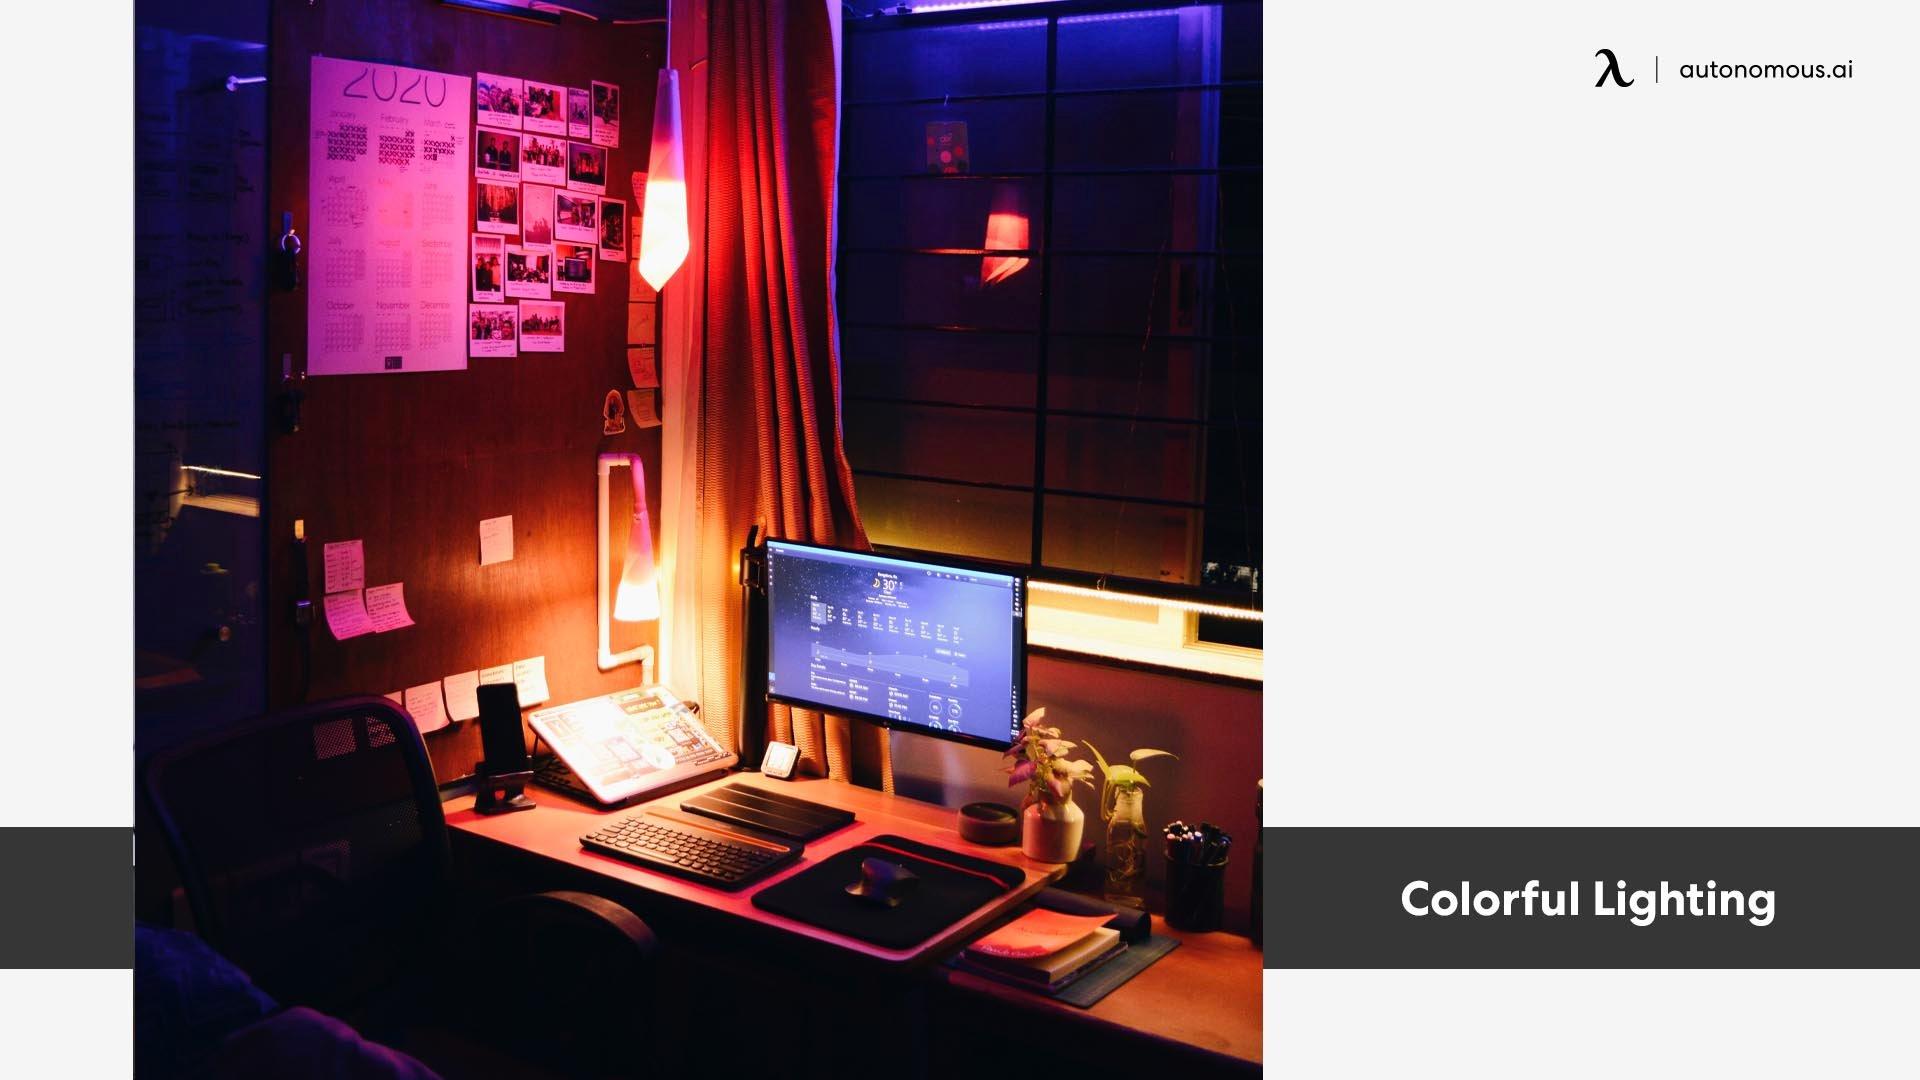 Photo of Colorful Lighting